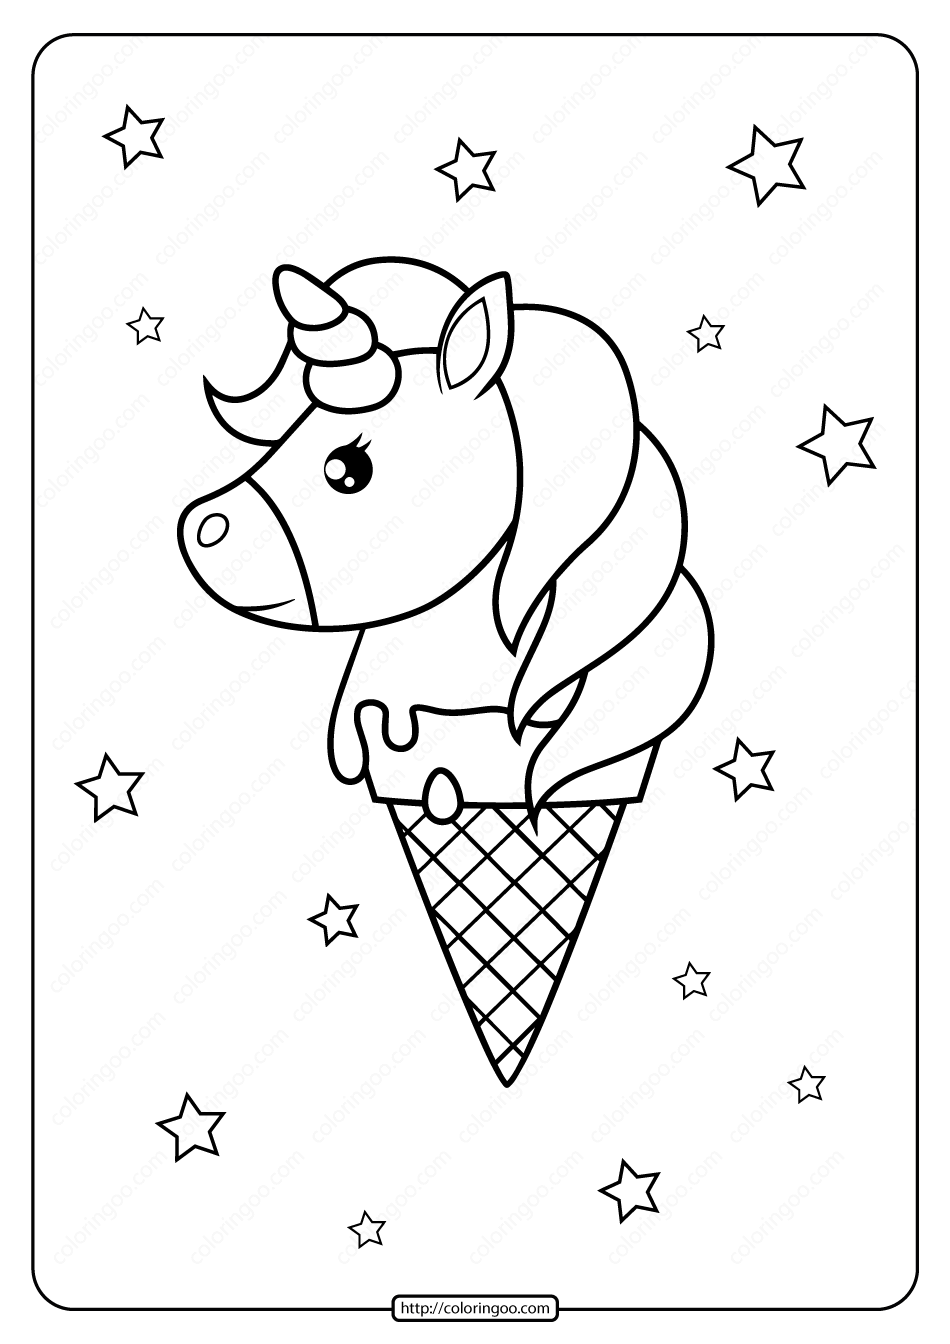 Printable Unicorn Ice Cream Cone Coloring Page In 2020 Unicorn Coloring Pages Unicorn Printables Unicorn Ice Cream